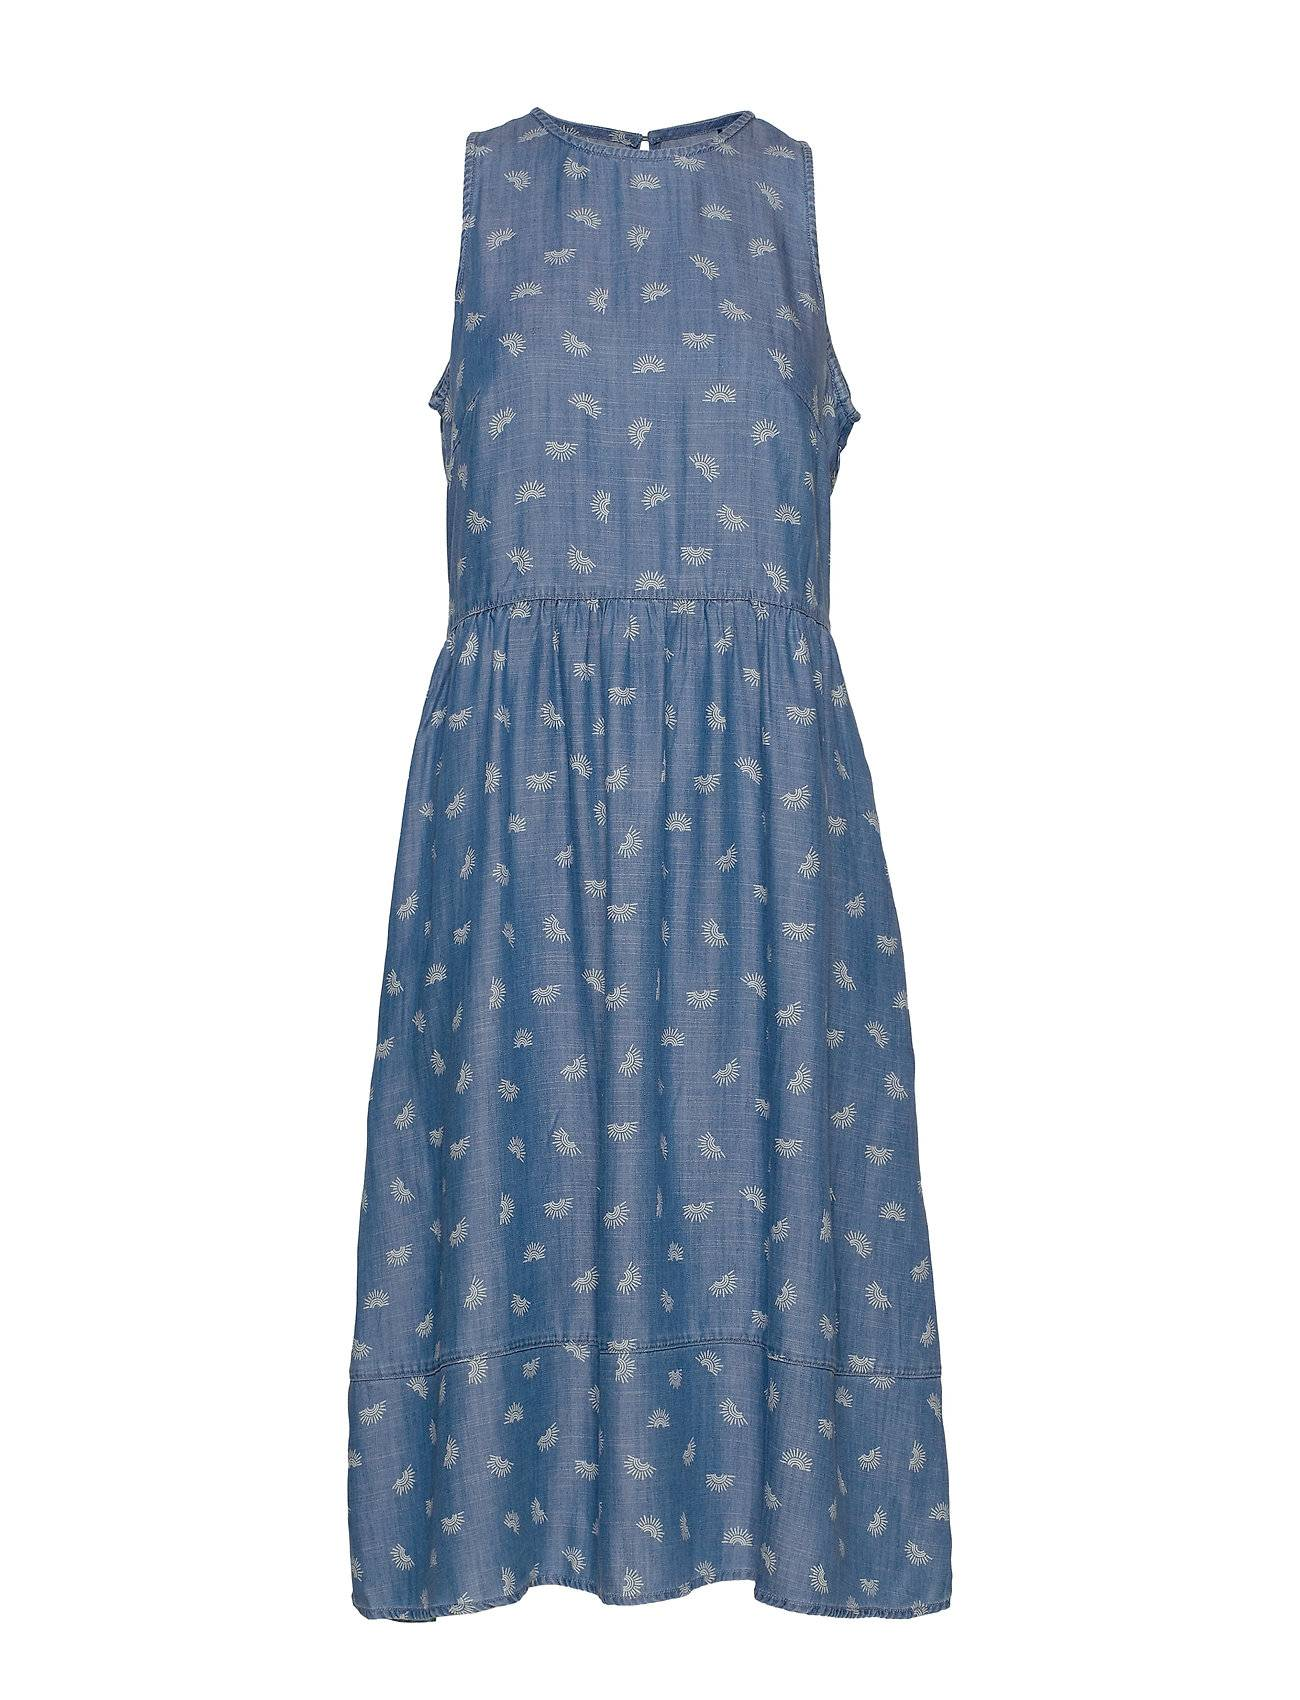 EDC by Esprit Dresses Denim Polvipituinen Mekko Sininen EDC By Esprit